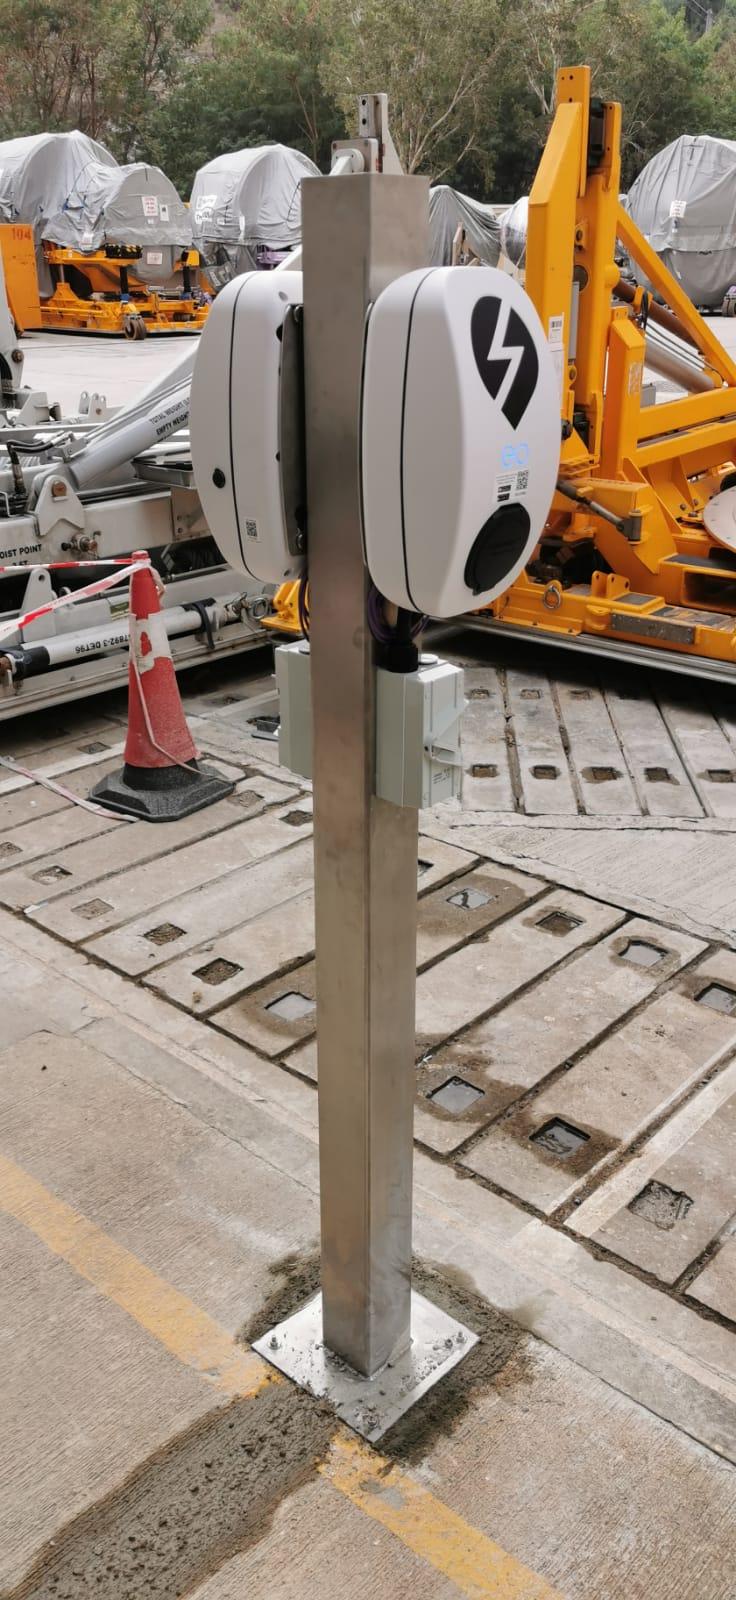 Double Post installation